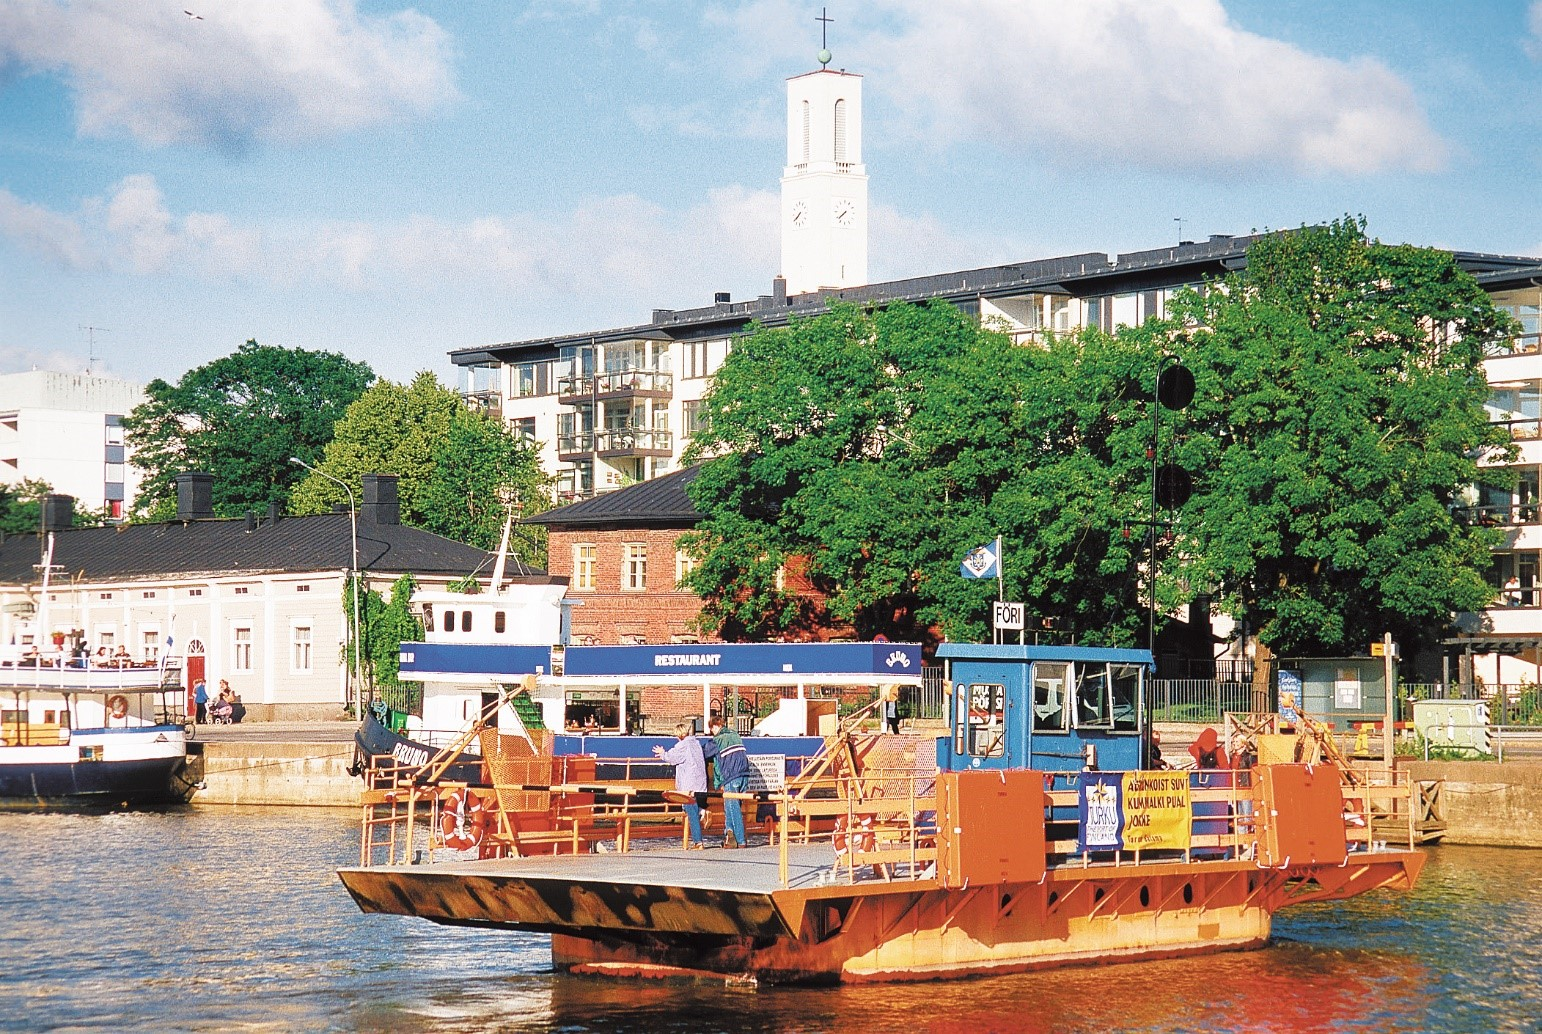 BACKPACKING IN FINLAND Tripbook  Hostels Worldwide